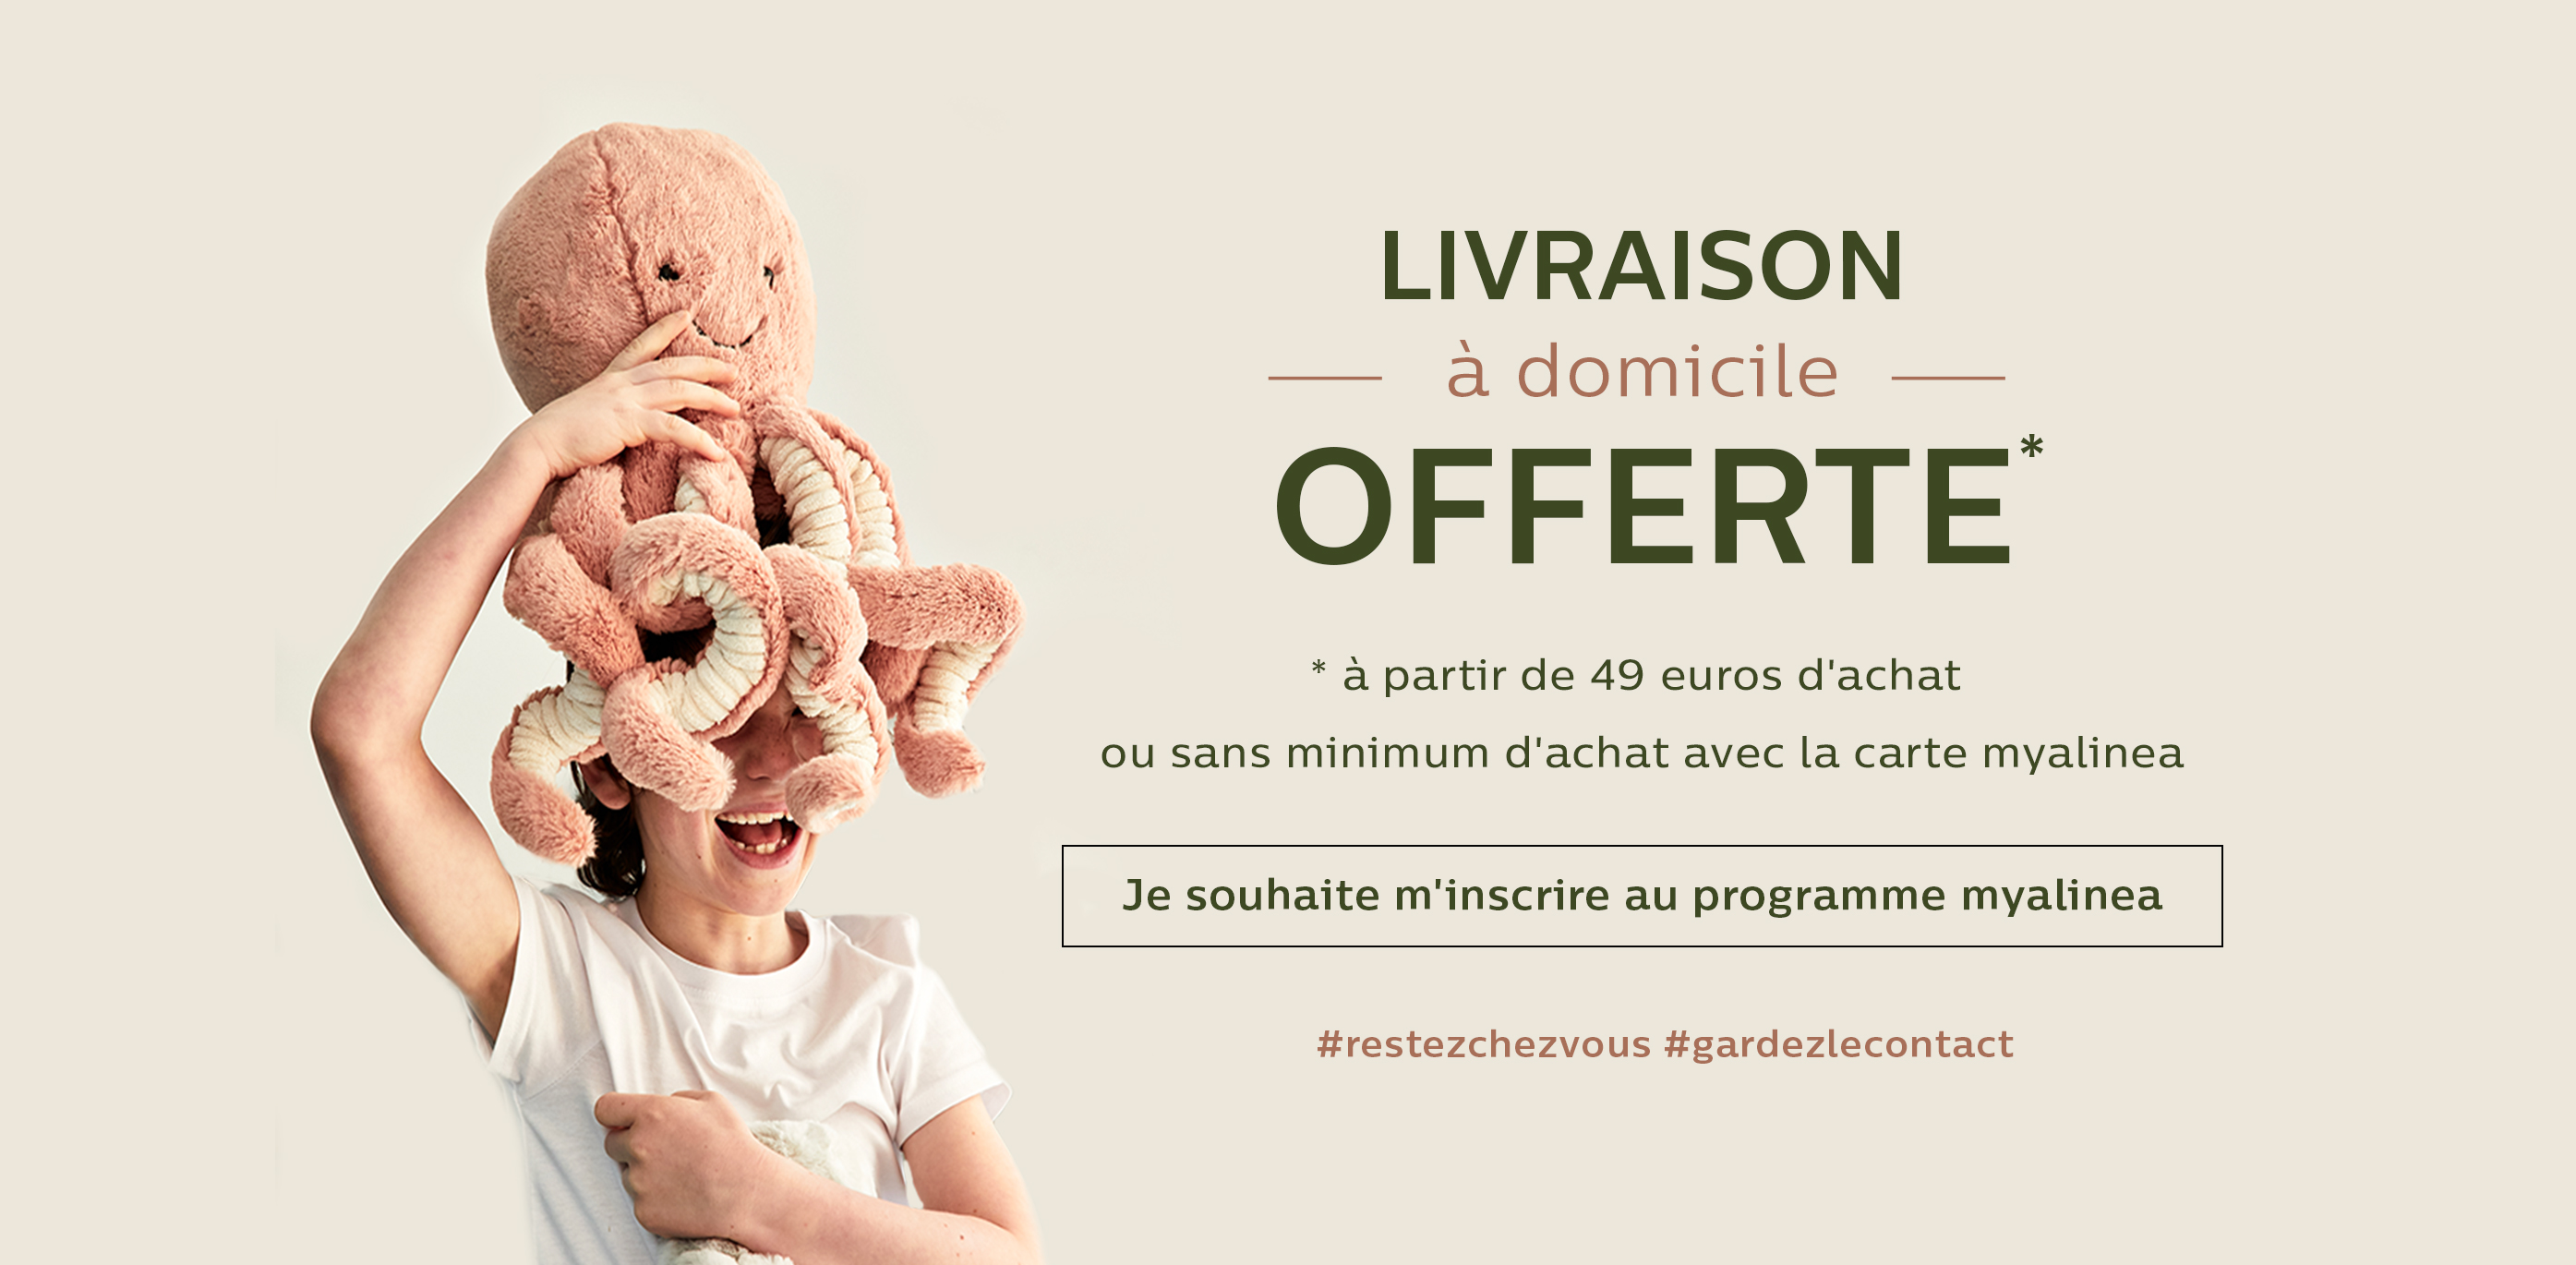 LIVRAISON-OFFERTE